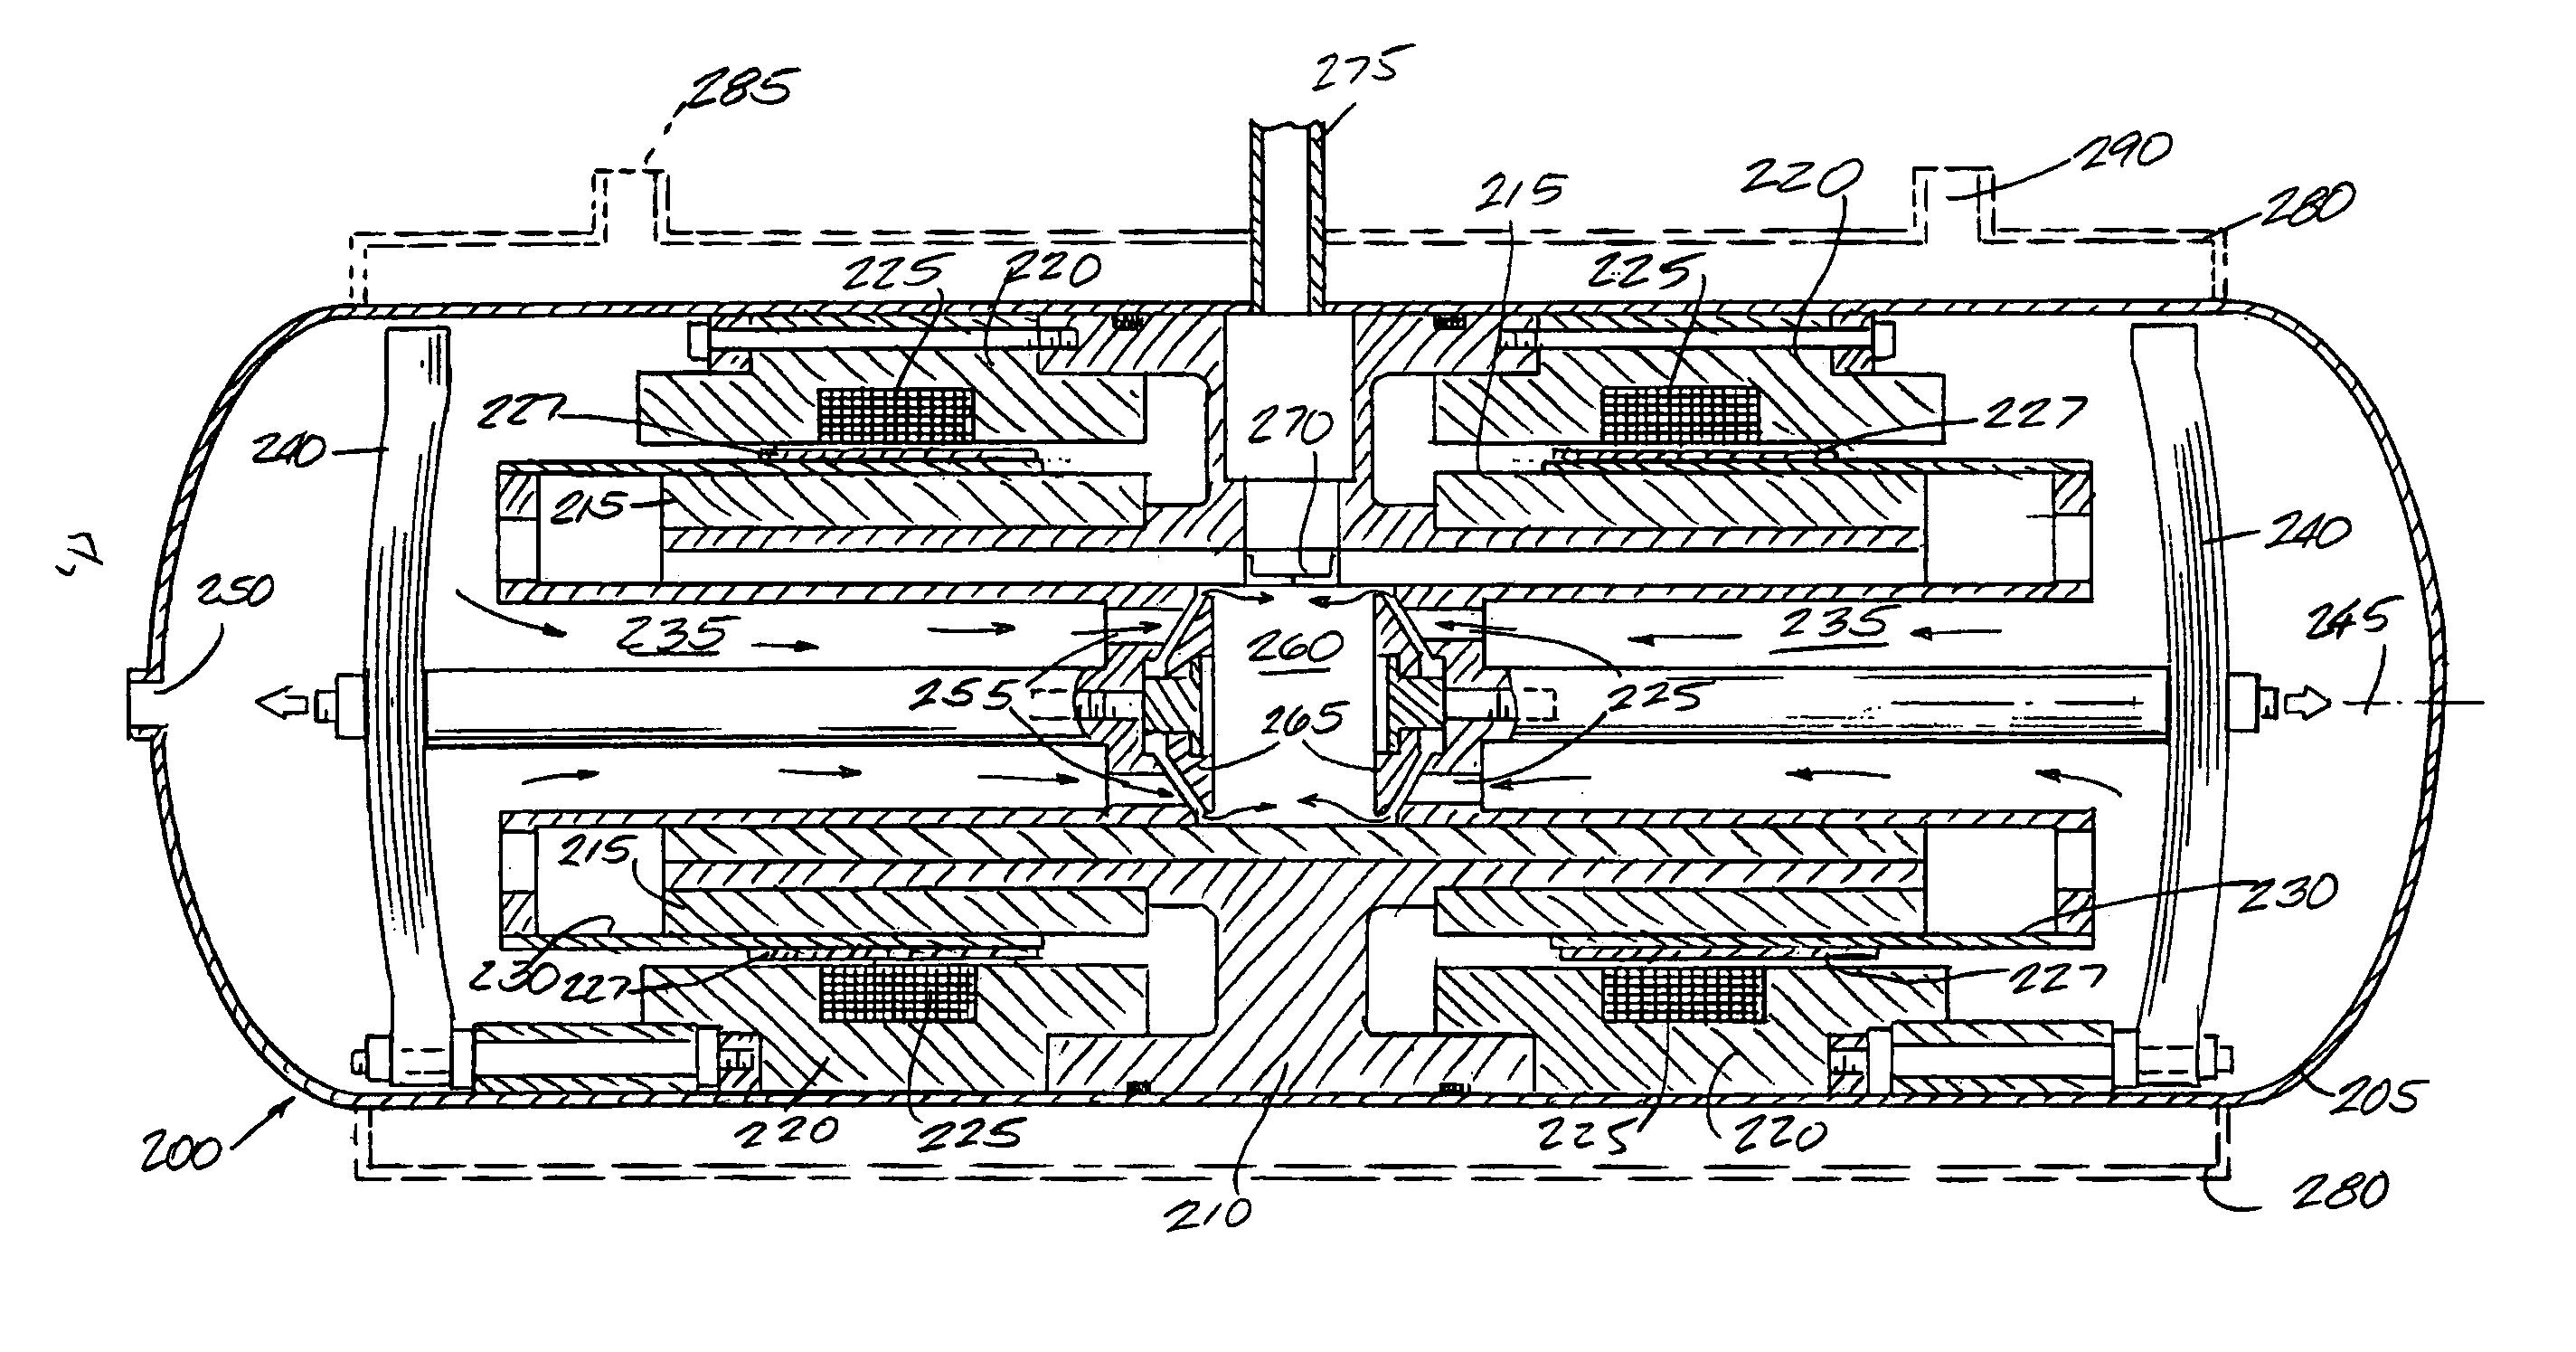 iring diagram linear compressor elmonic rh elmonic info Garage Air Compressor Line Layout Linear Compressor Technology Refrigerator